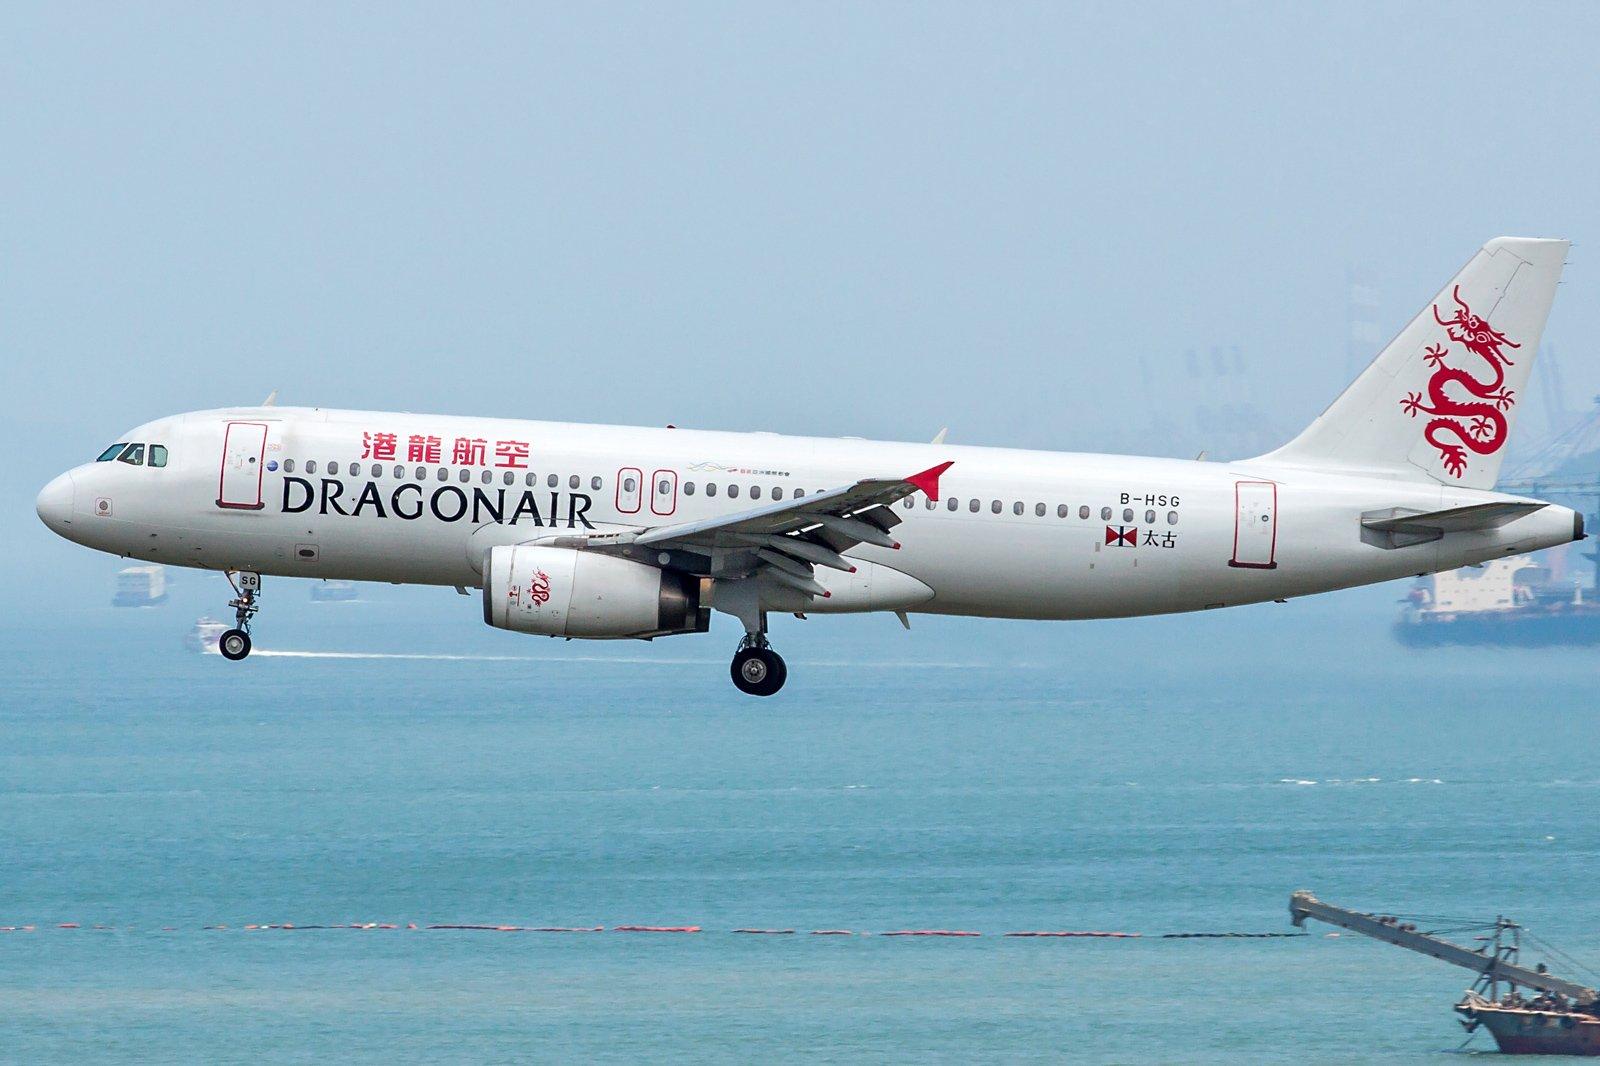 Cathay Dragon Airbus A320-232 B-HSG